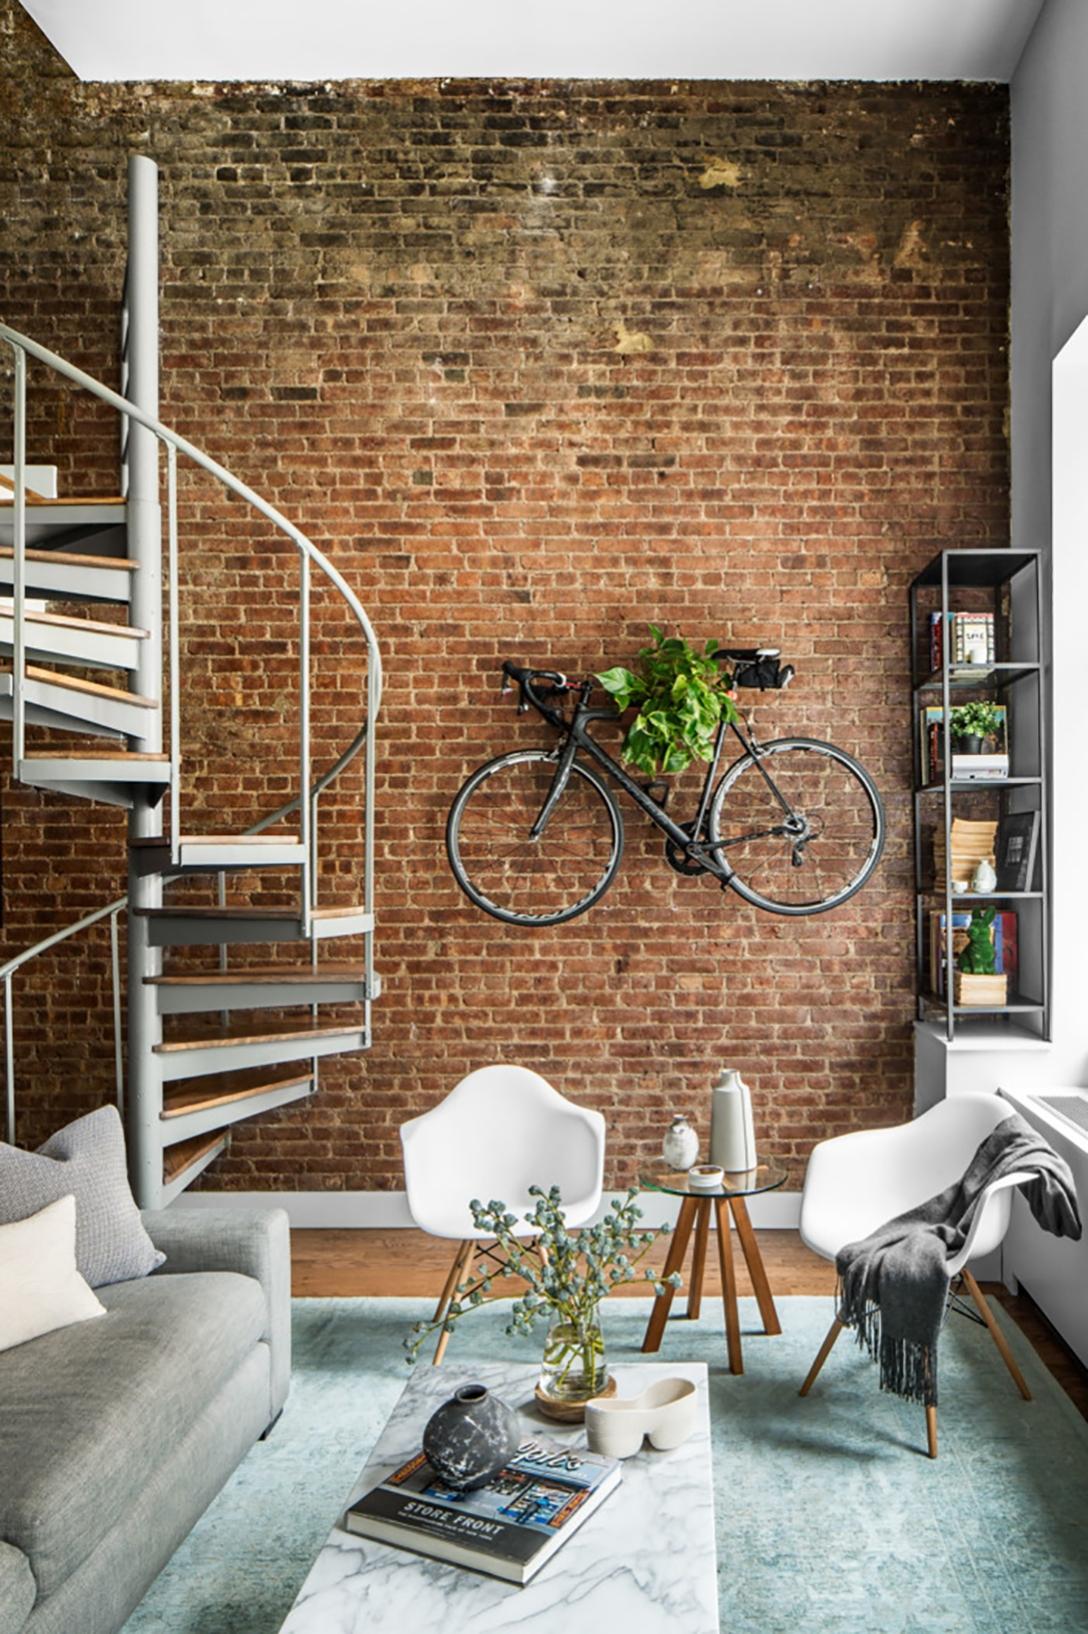 homepolish-interior-design-4a6a2-703x1056